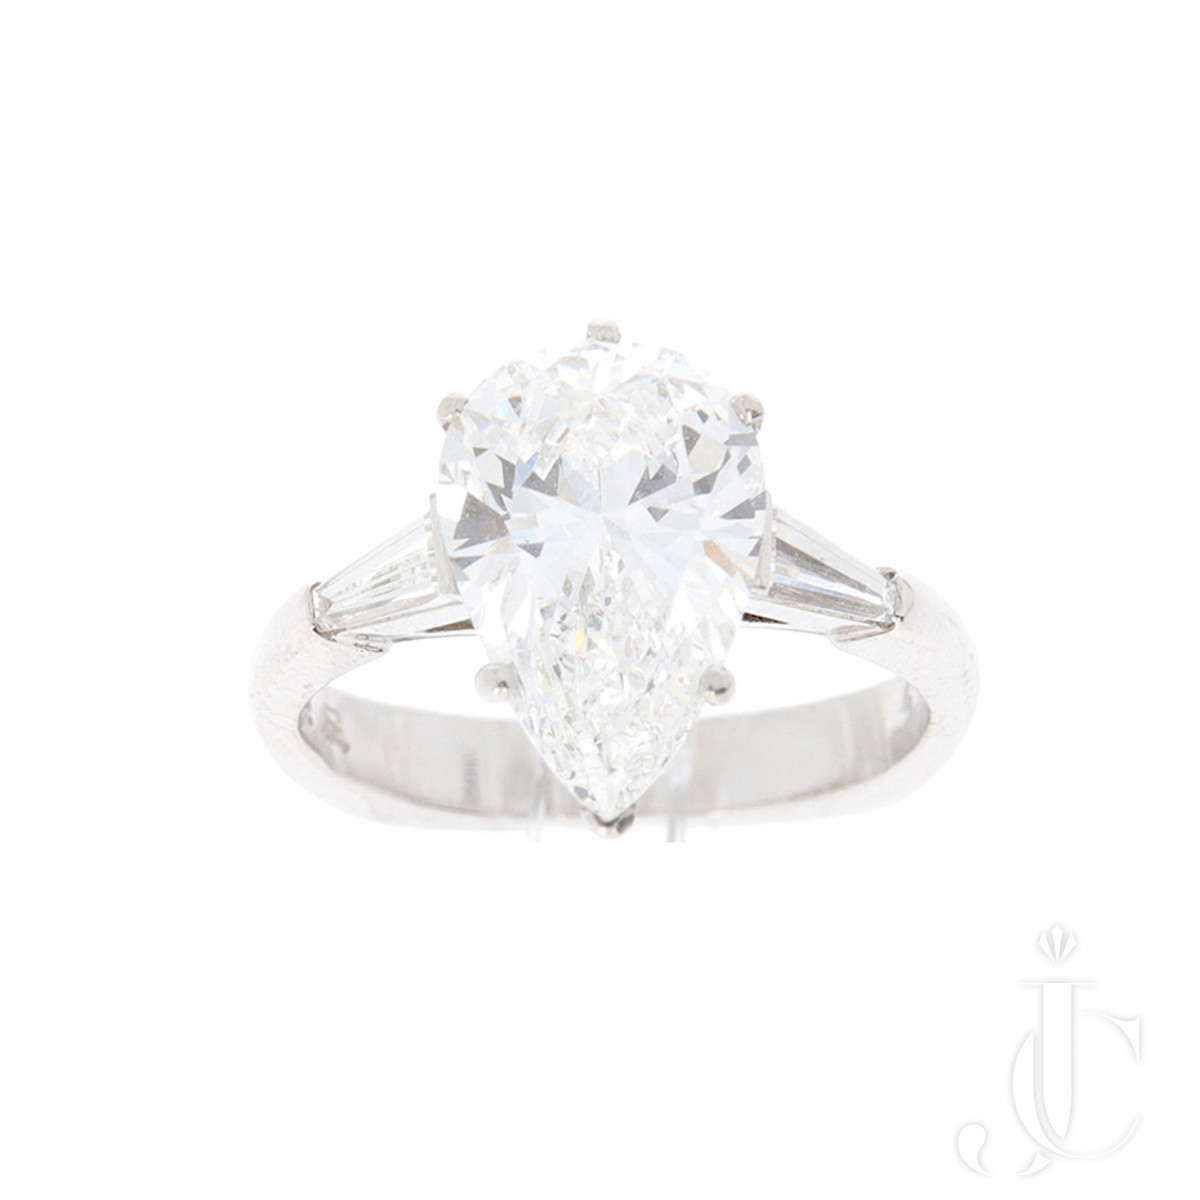 3,30 ct Pear Shape Diamond Ring